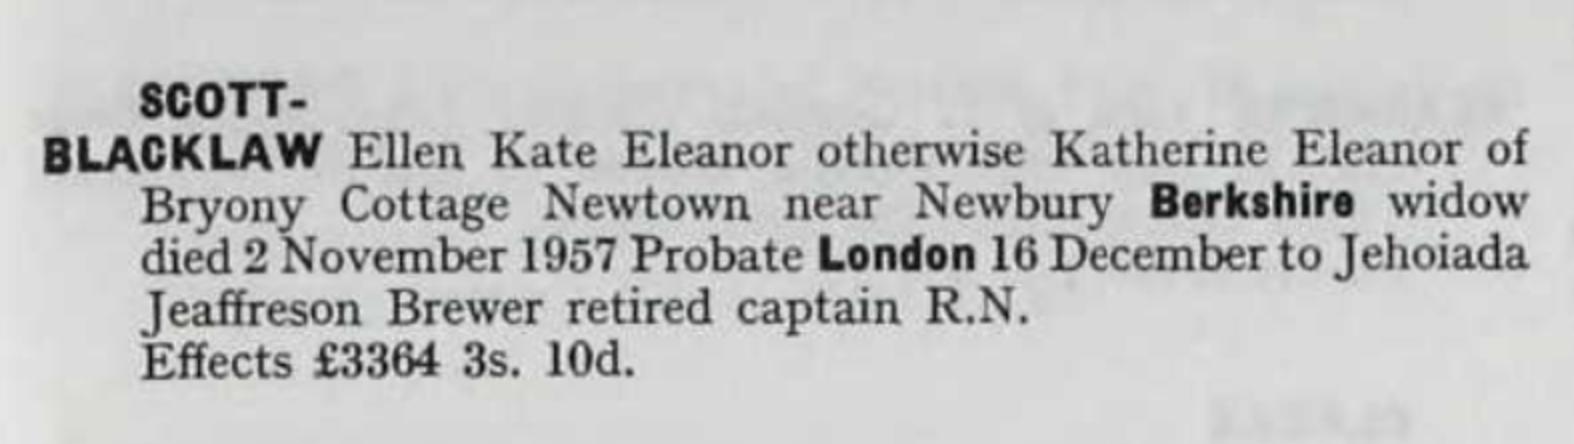 Eleanor Katherine Ellen Man Blacklaw Probate